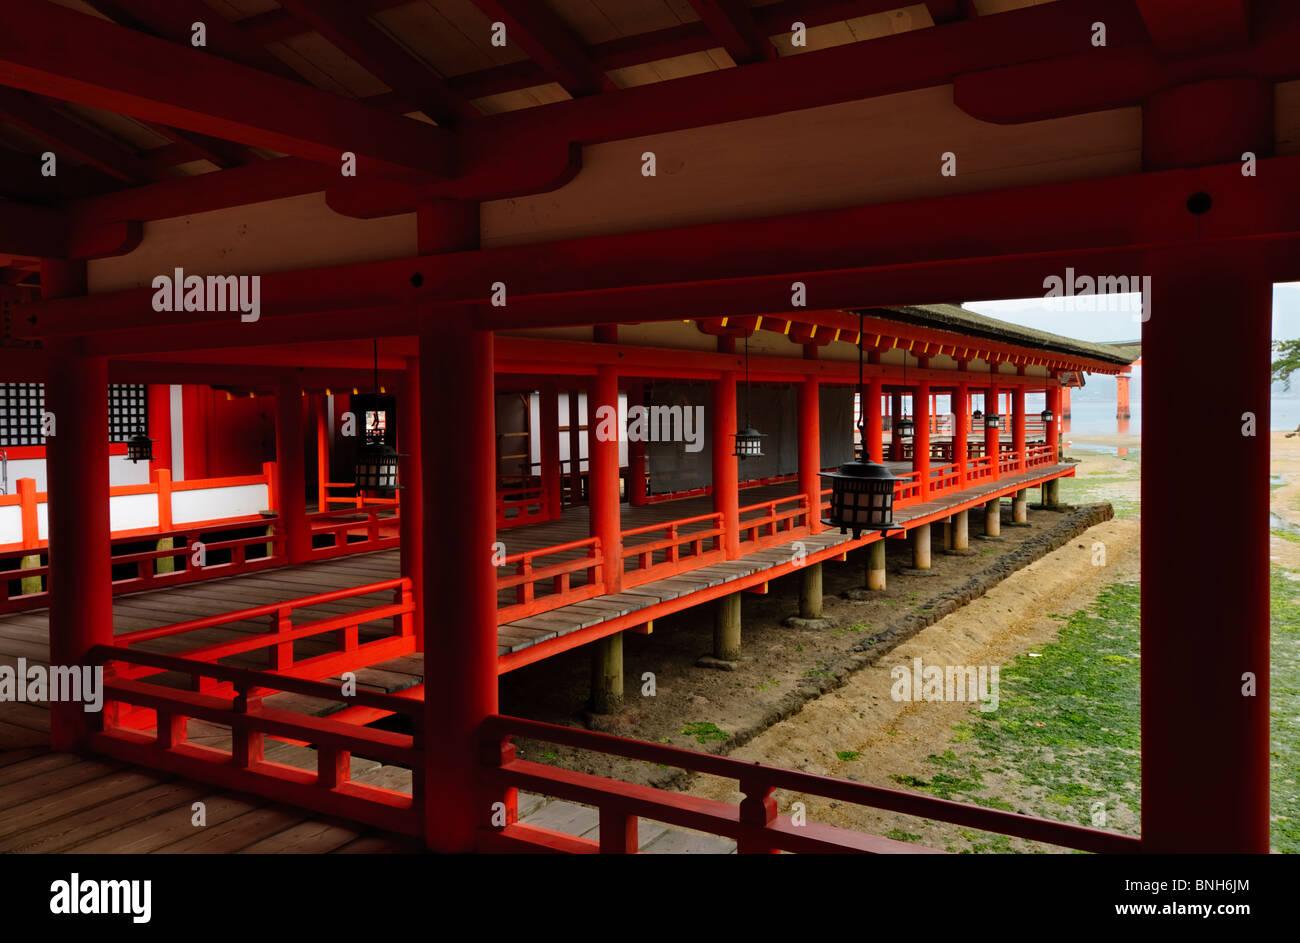 Korridoren am Itsukushima-Schrein Itsukushima-Schrein, Miyajima, Honshu, Japan Stockbild